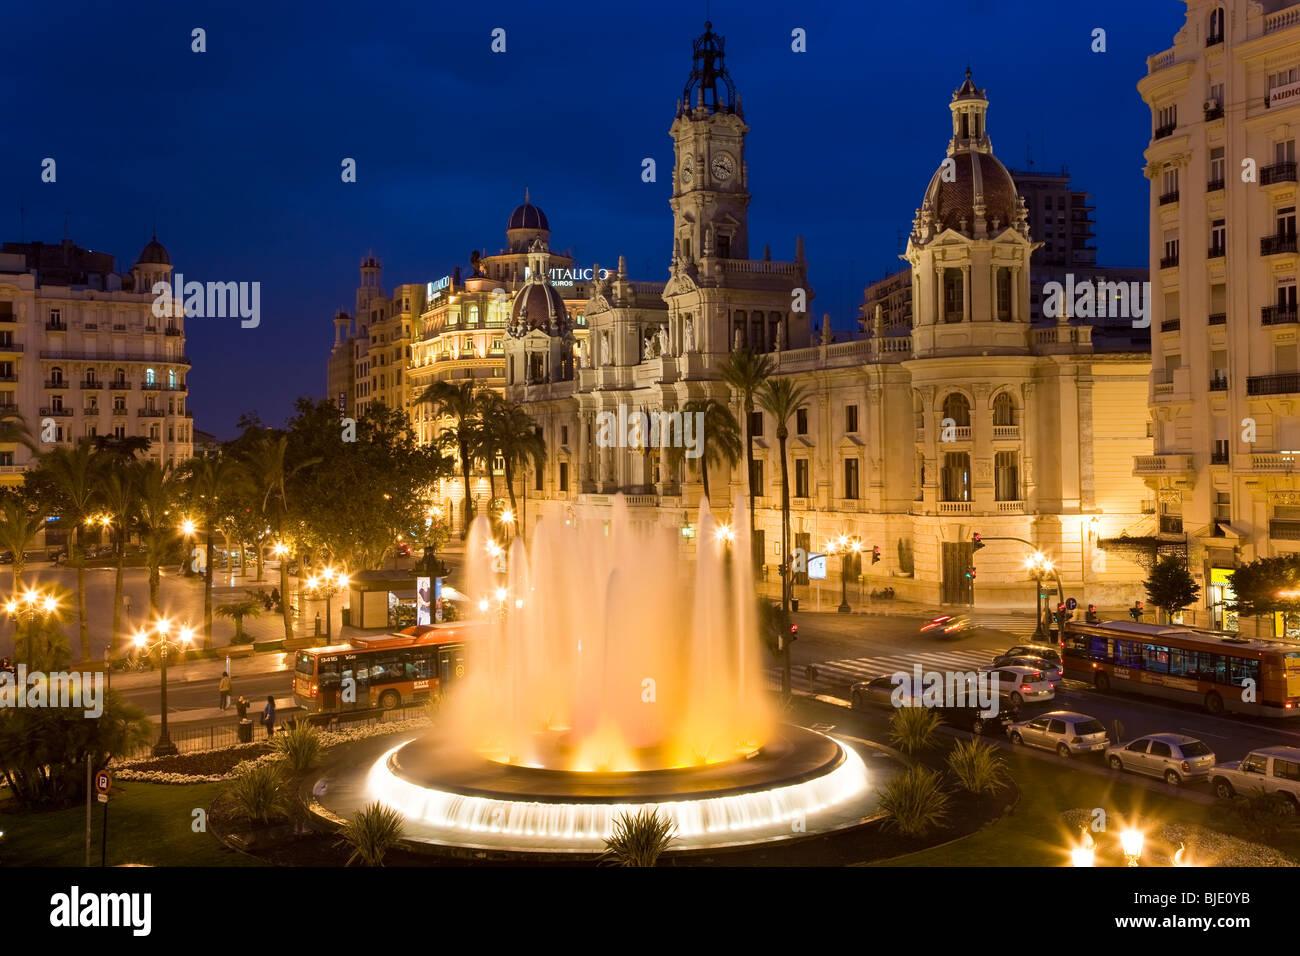 The Town Hall & fountain Plaza del Aguntamiento Valencia Costa del Azahar Valencia Province Spain - Stock Image